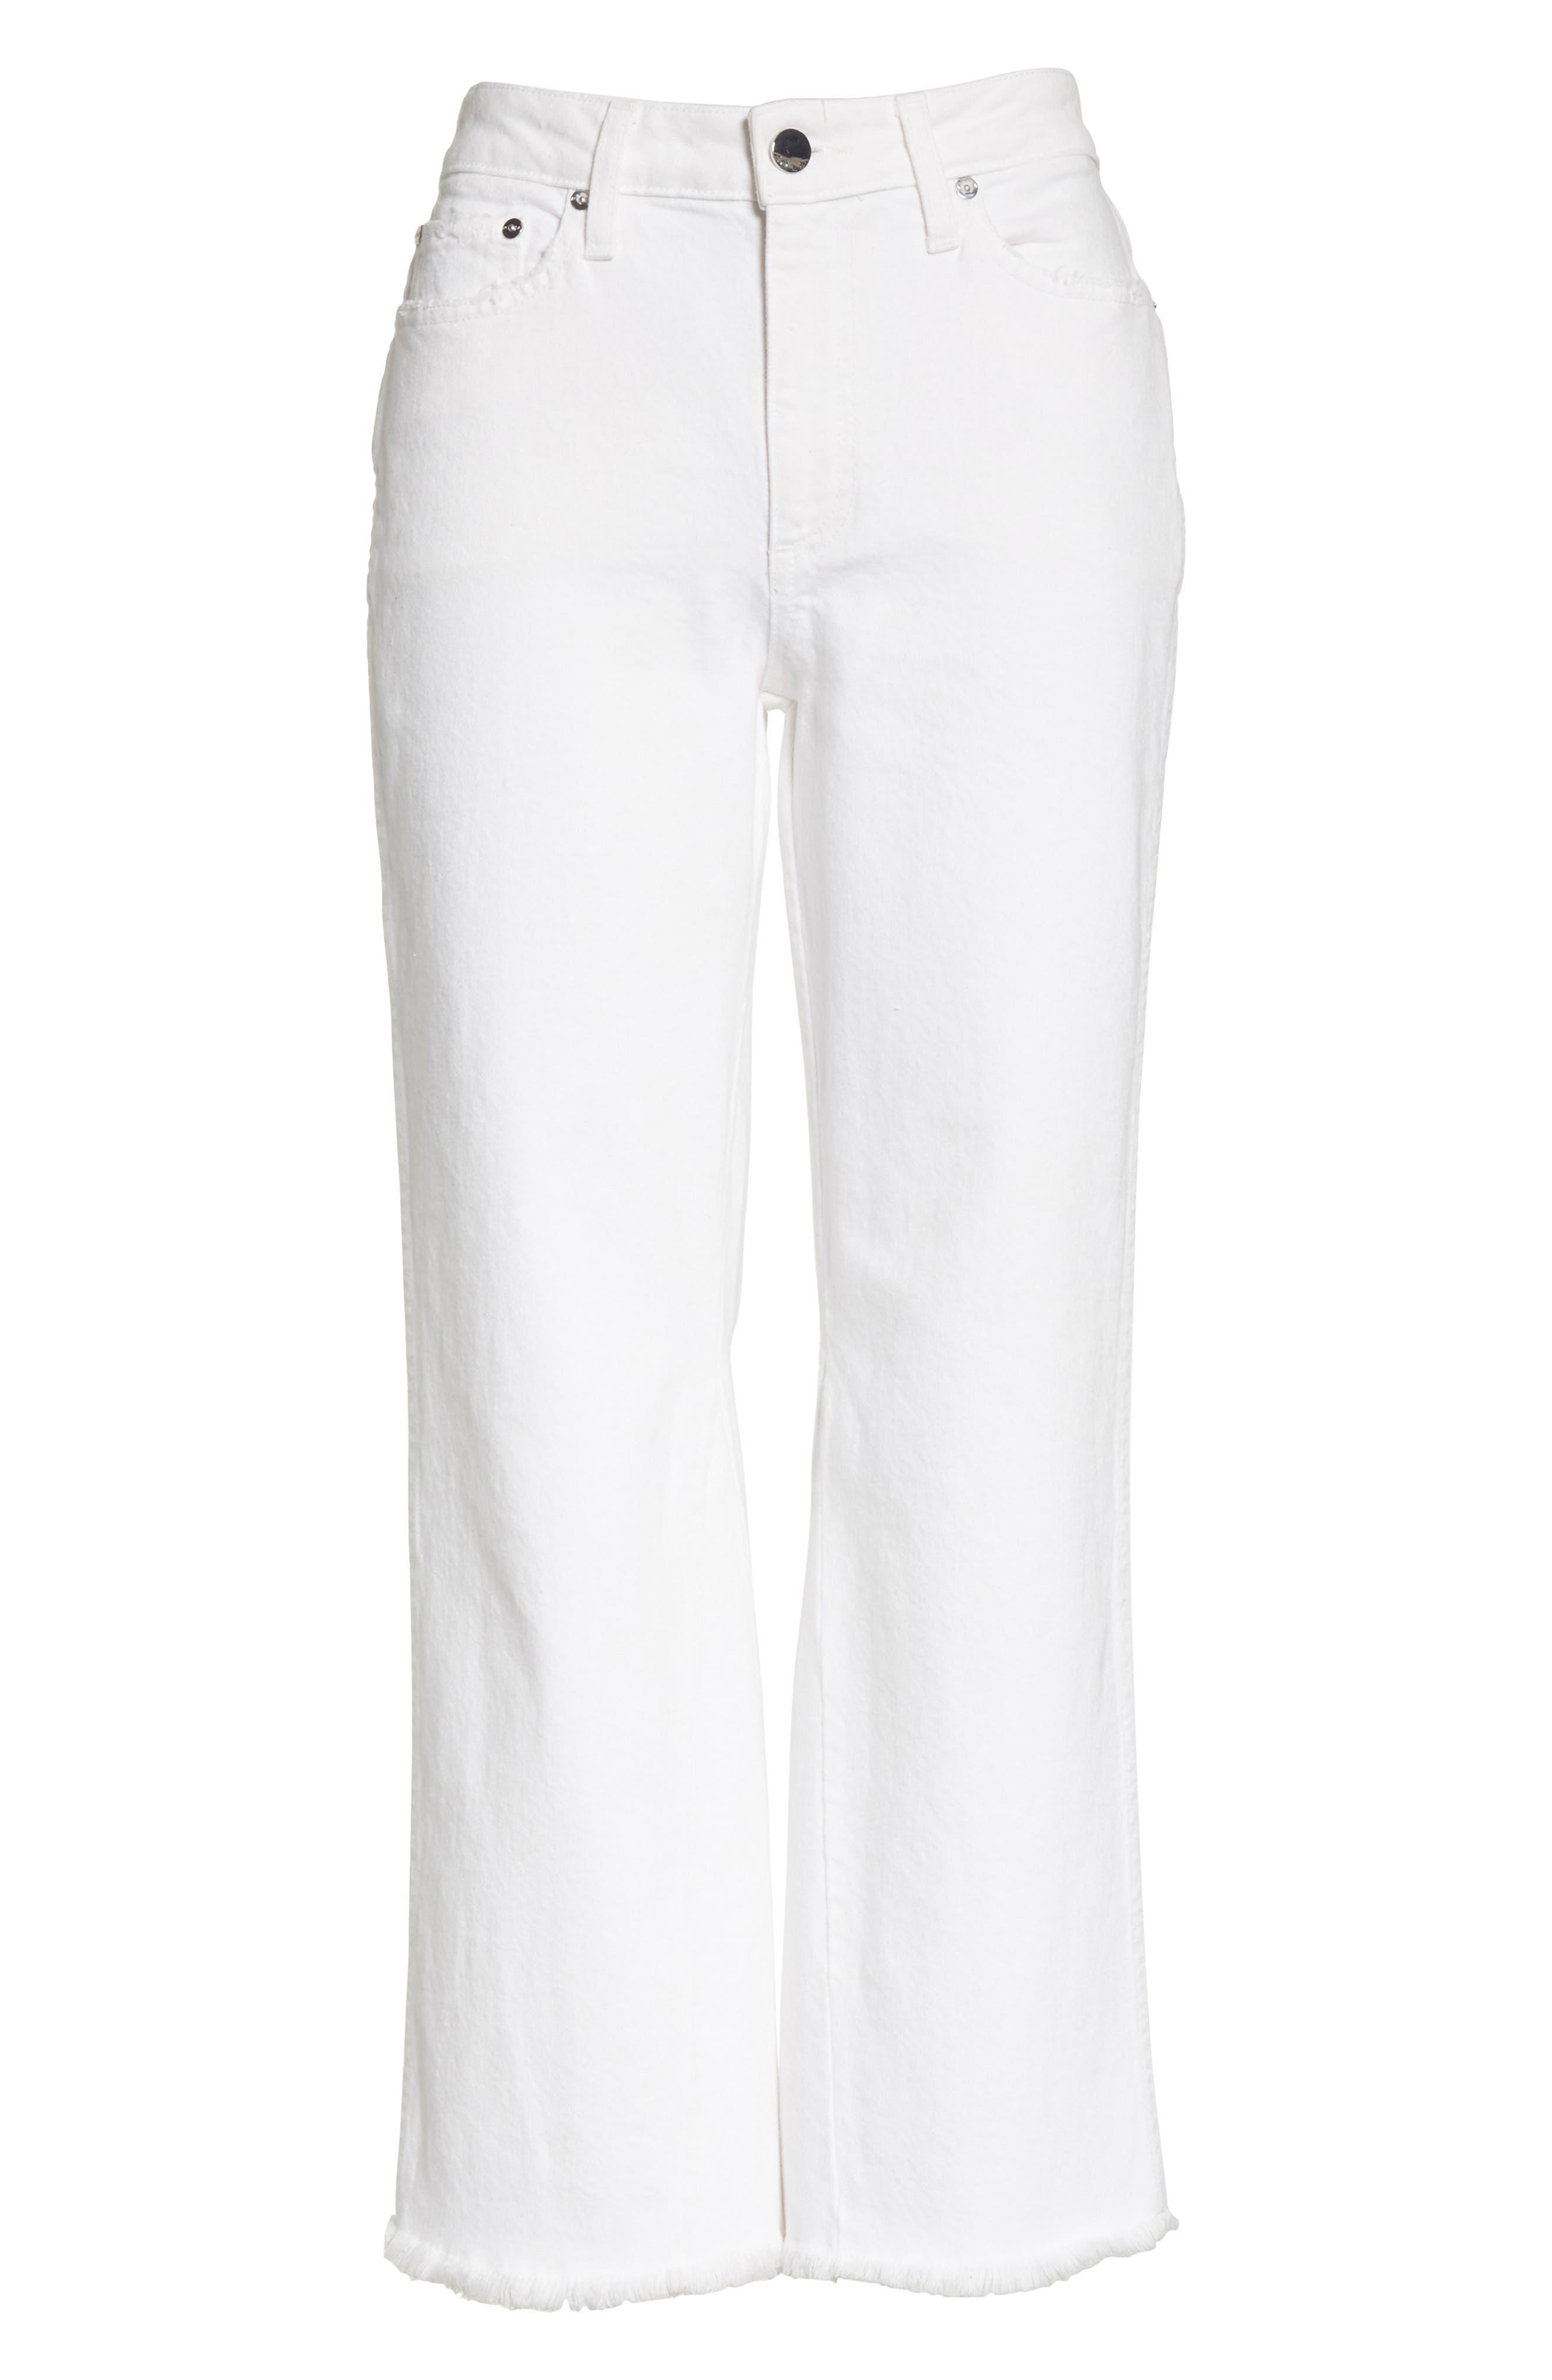 AO.LA Perfect Crop Kick Flare Jeans,                             Alternate thumbnail 6, color,                             160